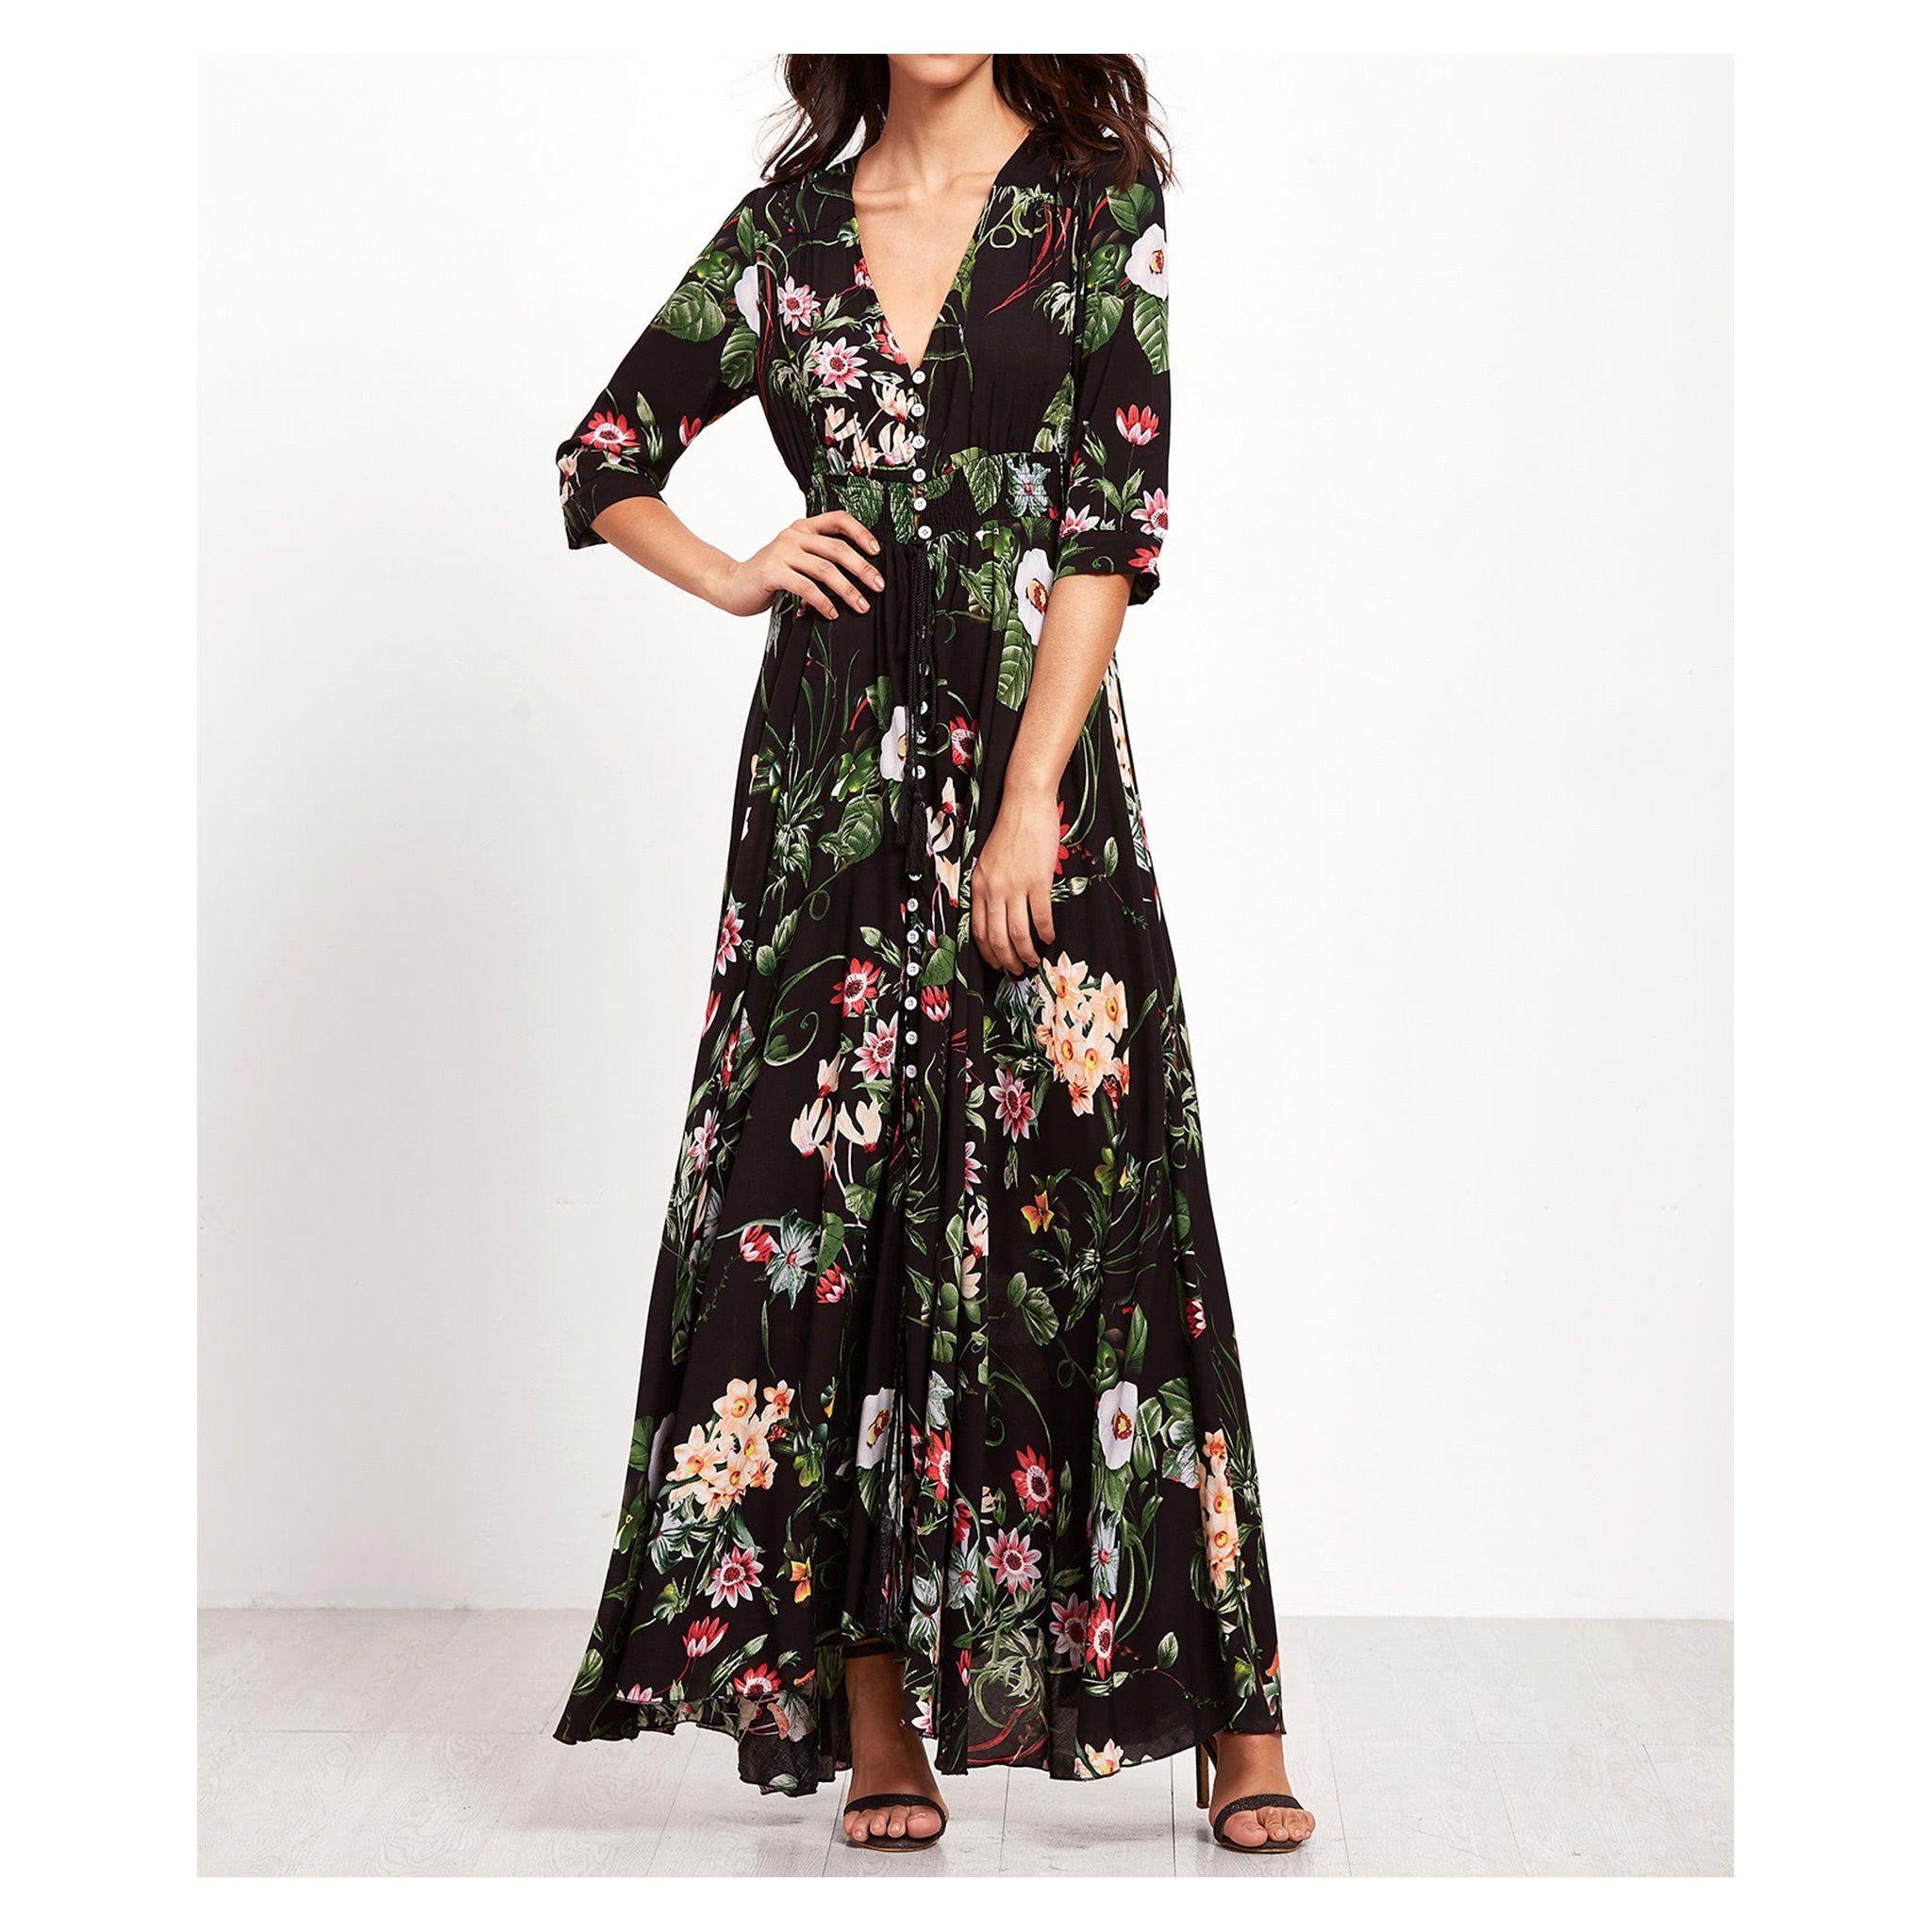 Black Floral Print Button Down 3 4 Sleeve Maxi Dress Floral Dress Casual Maxi Dress Womens Maxi Dresses [ 2048 x 2048 Pixel ]